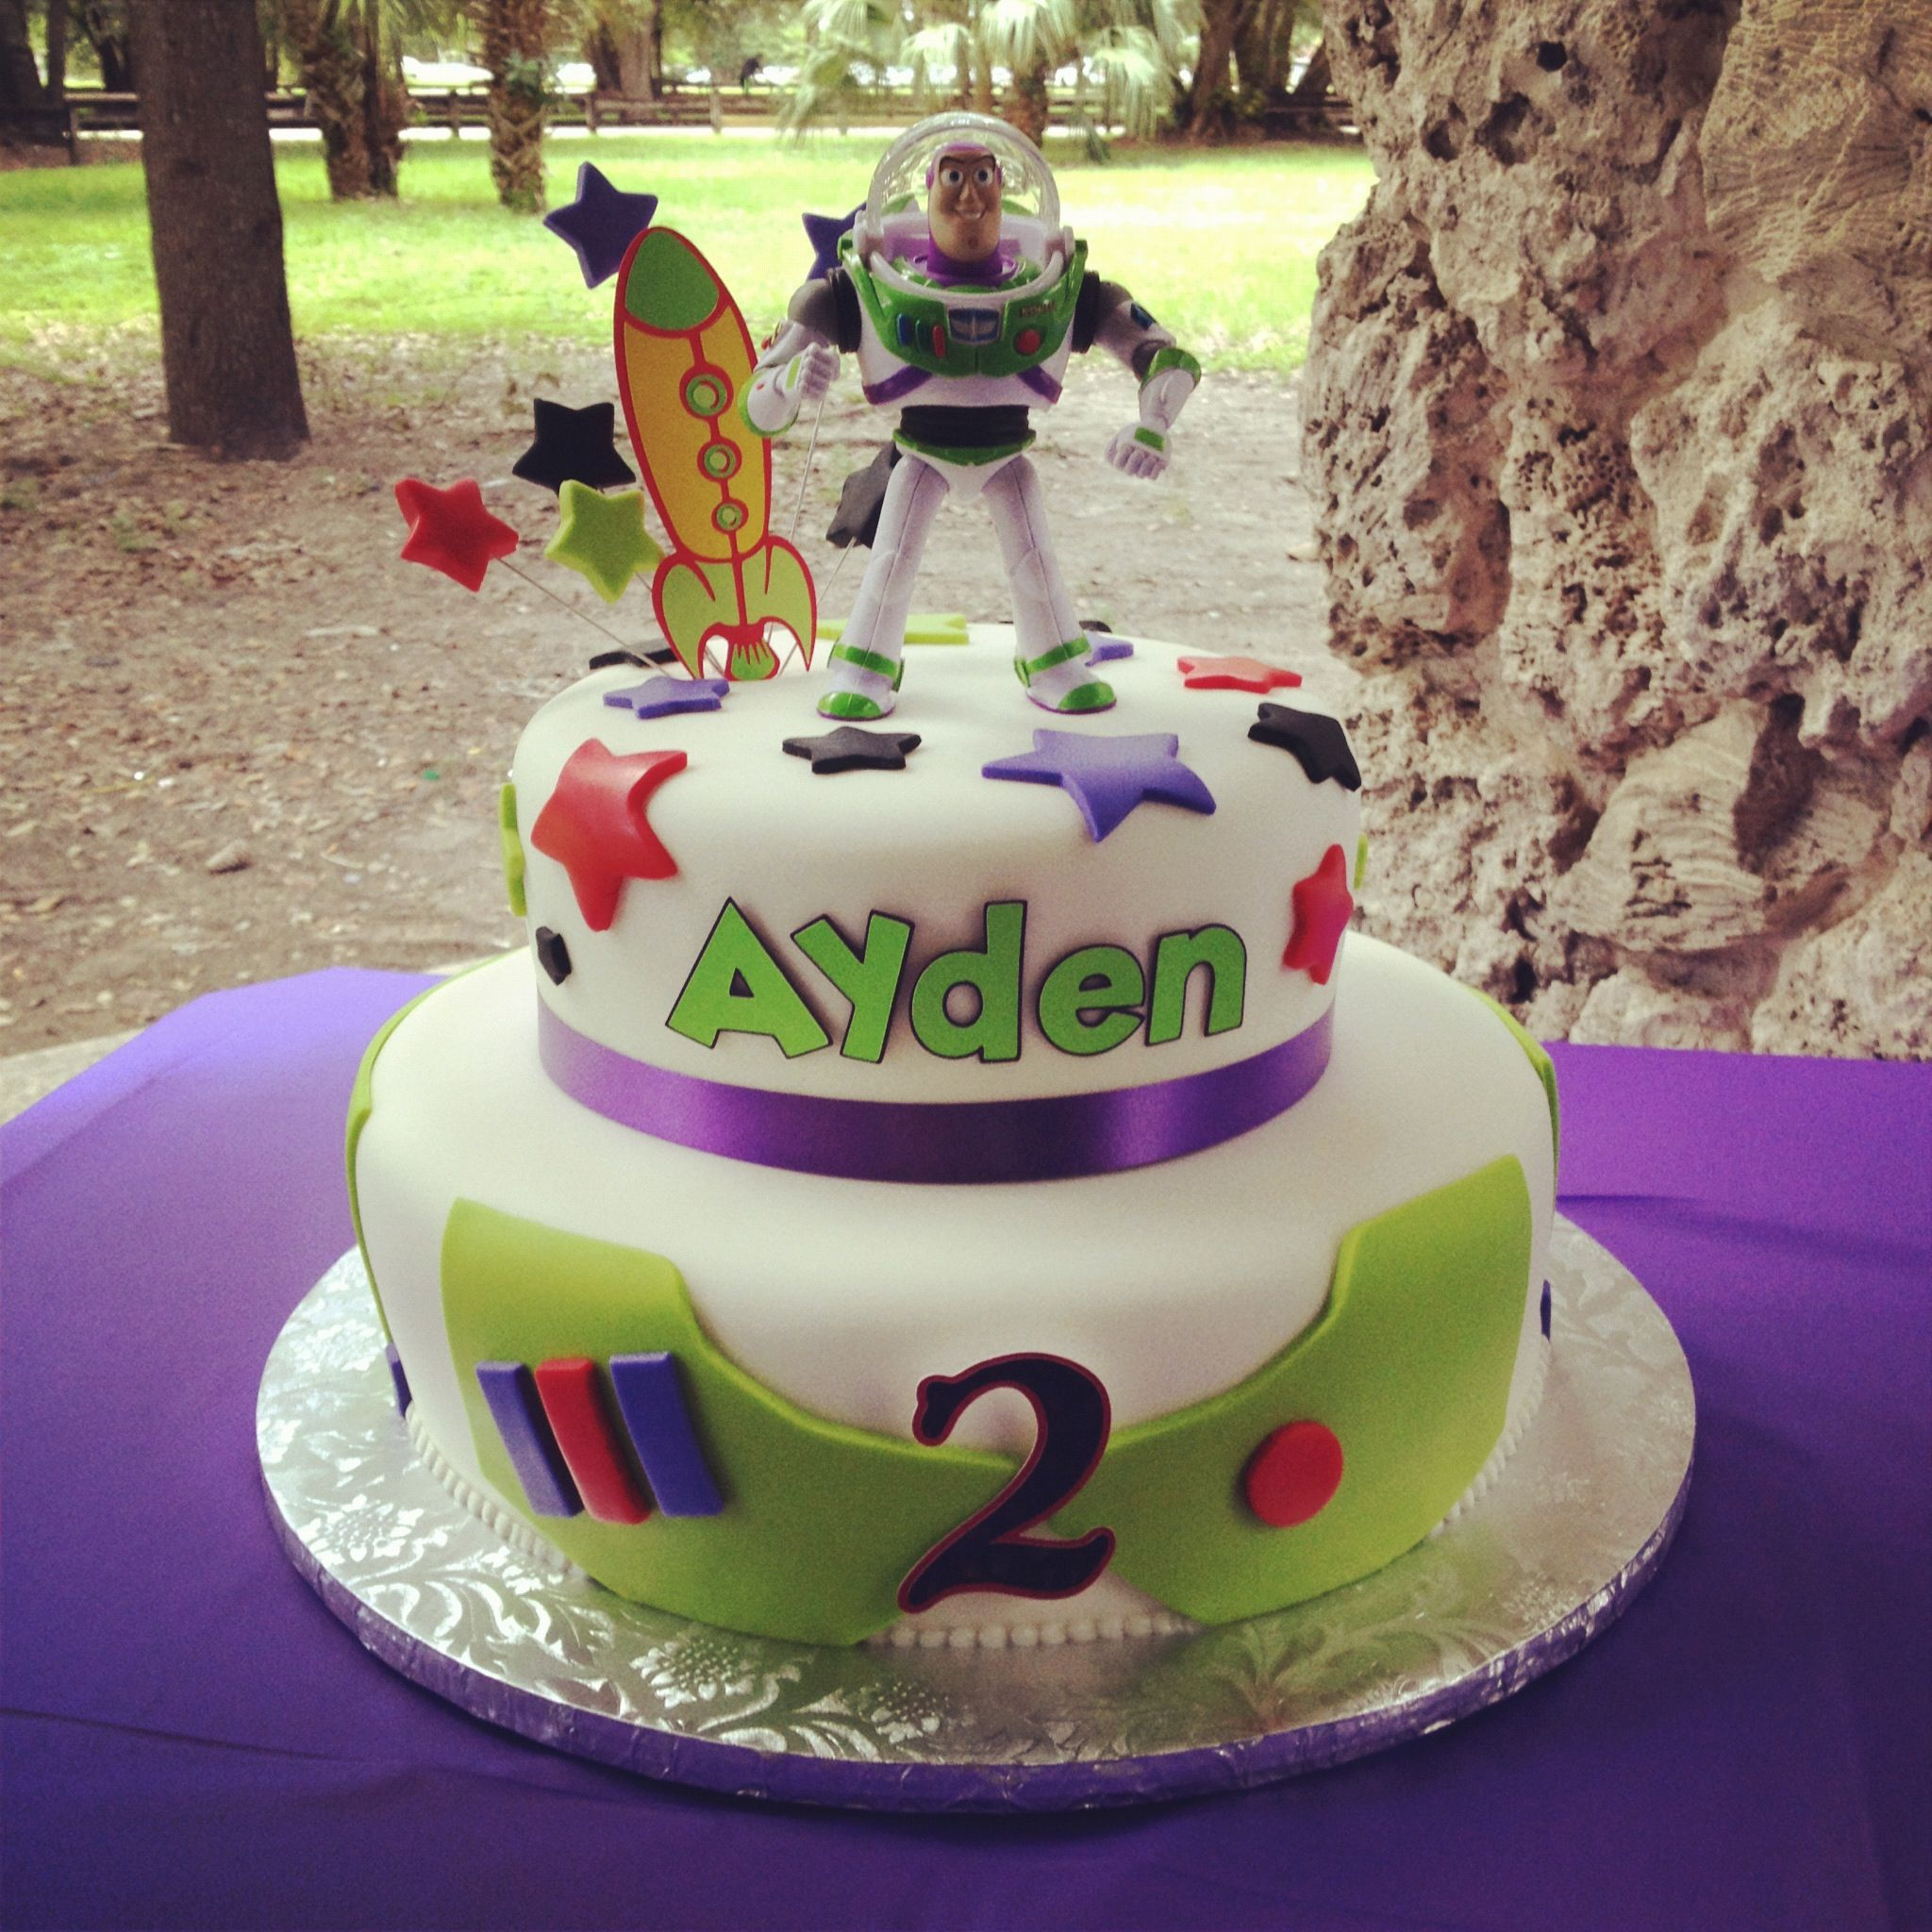 Aydens buzz lightyear birthday cake 0 cake toy story